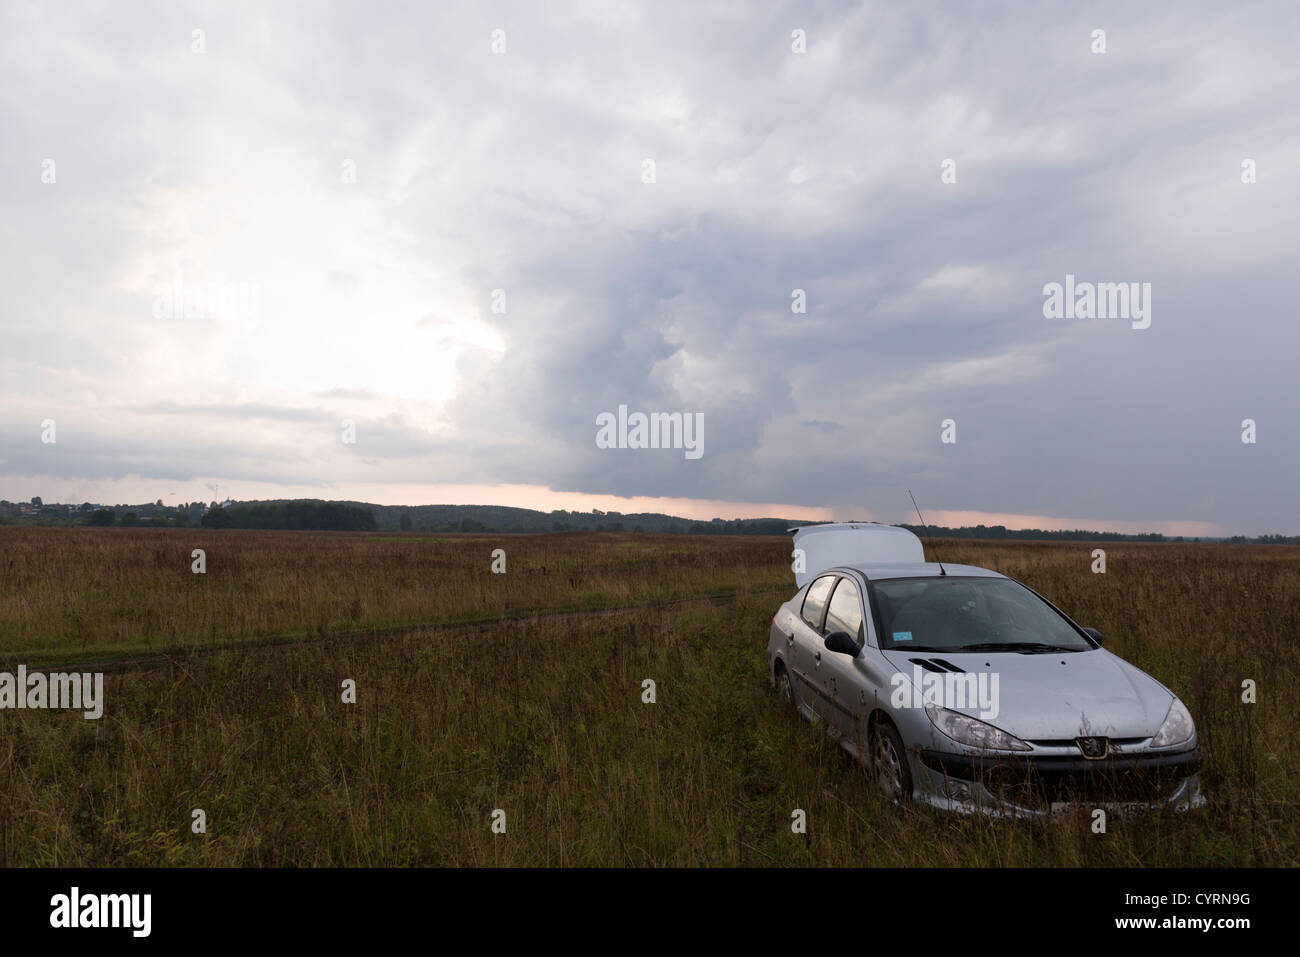 Kasimov Threats gray cloudy moody storm sky scenic - Stock Image